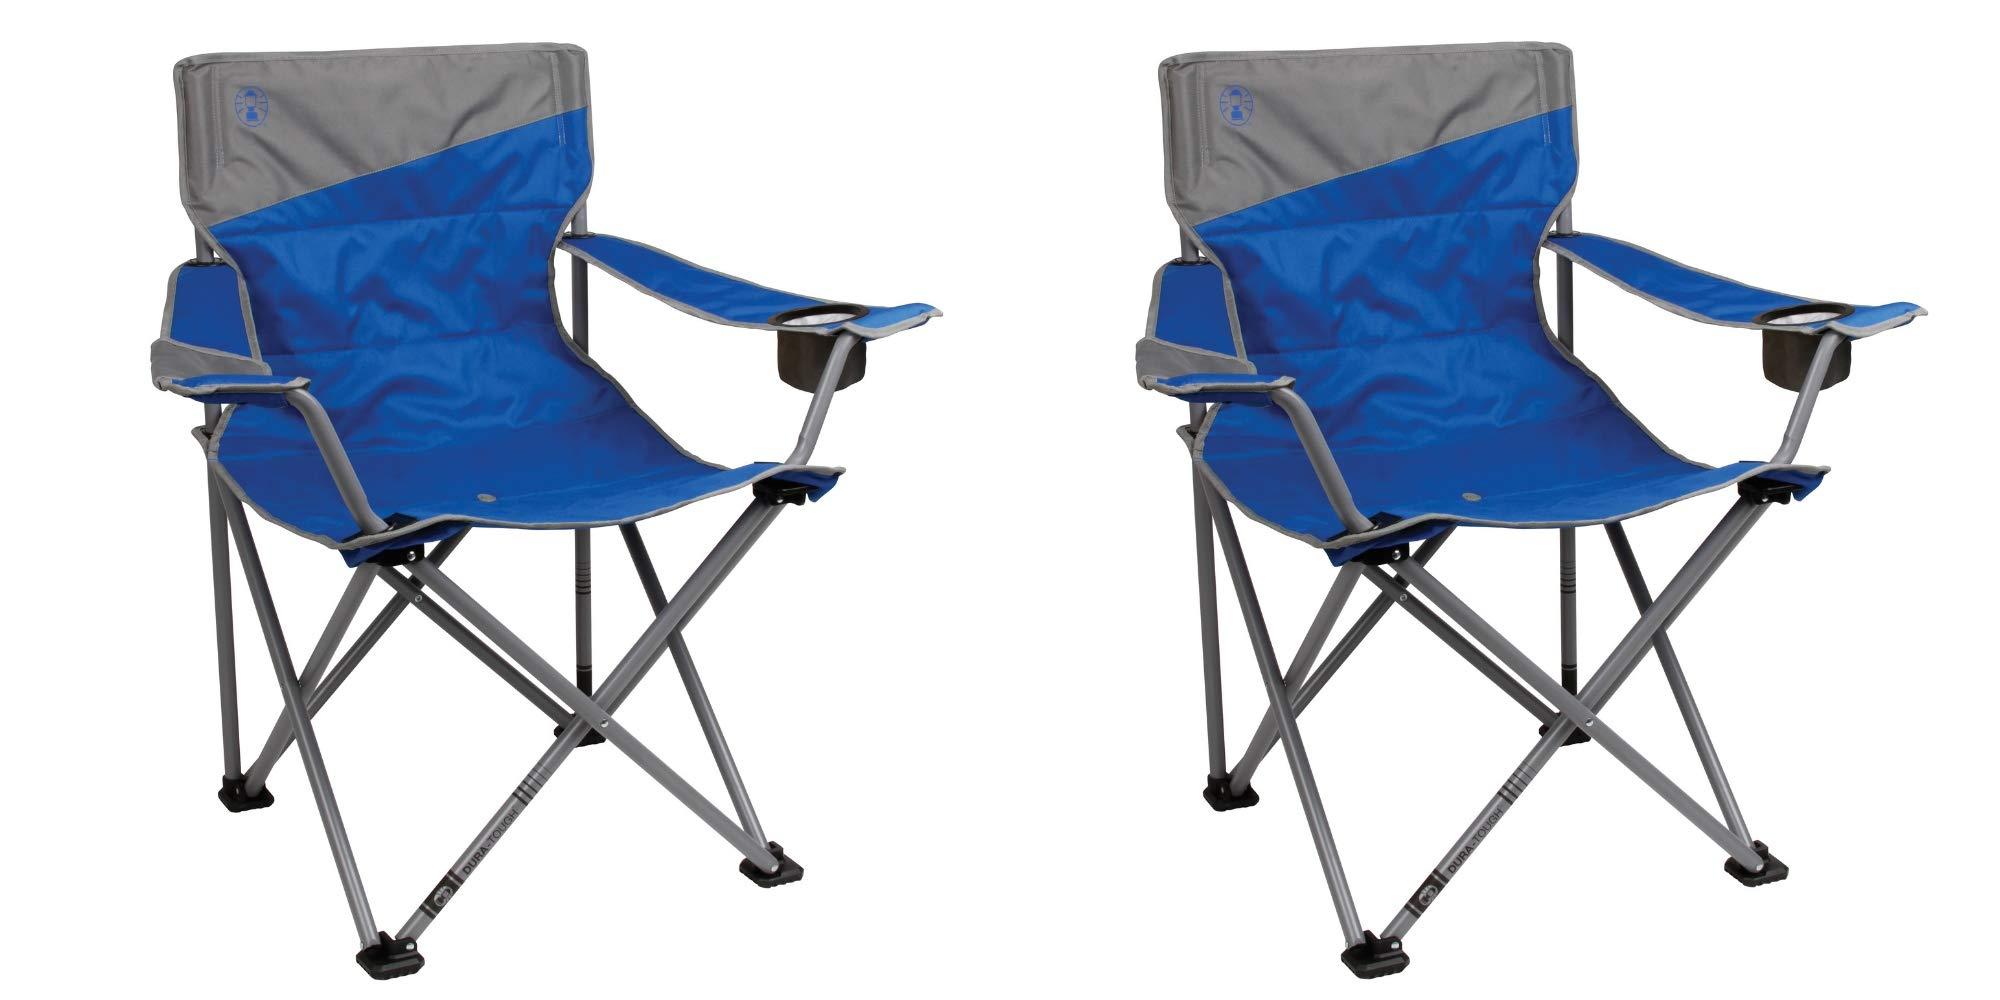 Coleman Big-N-Tall Quad Camping Chair / 2-Pack